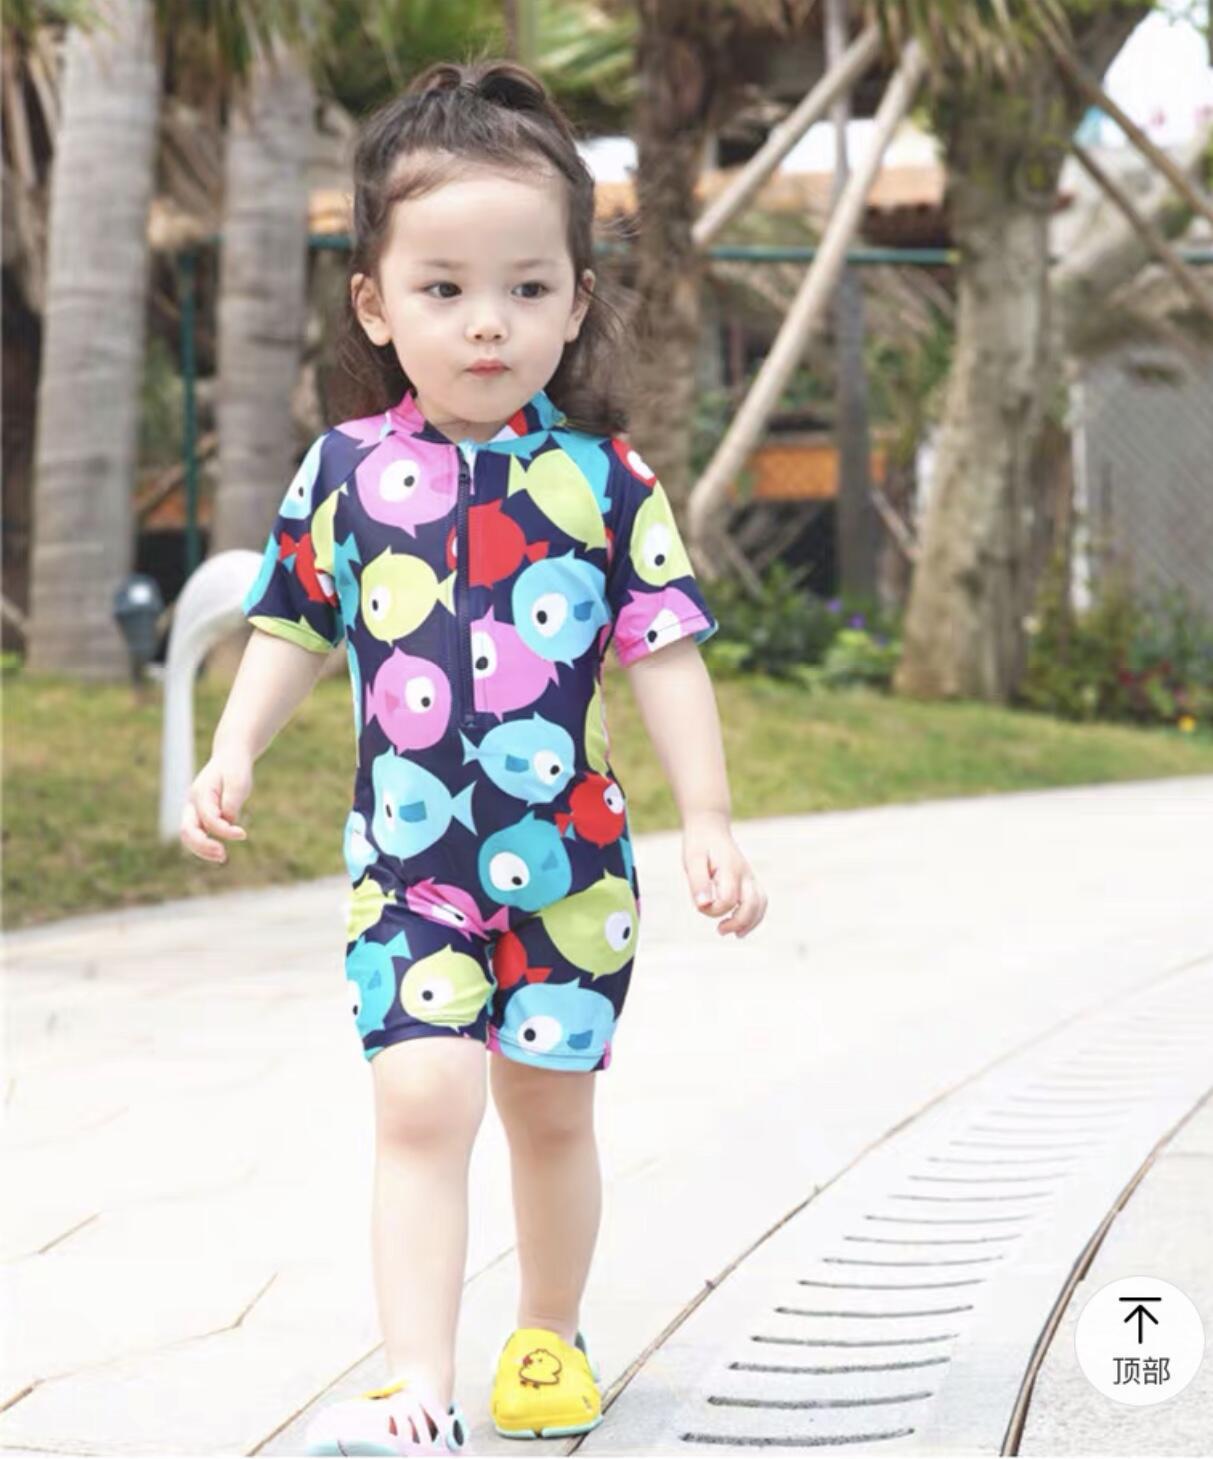 KID'S Swimwear BOY'S Girls One-piece Big Boy Small CHILDREN'S Long Sleeve Beach Sun-resistant Boy Baby Cute Bathing Suit